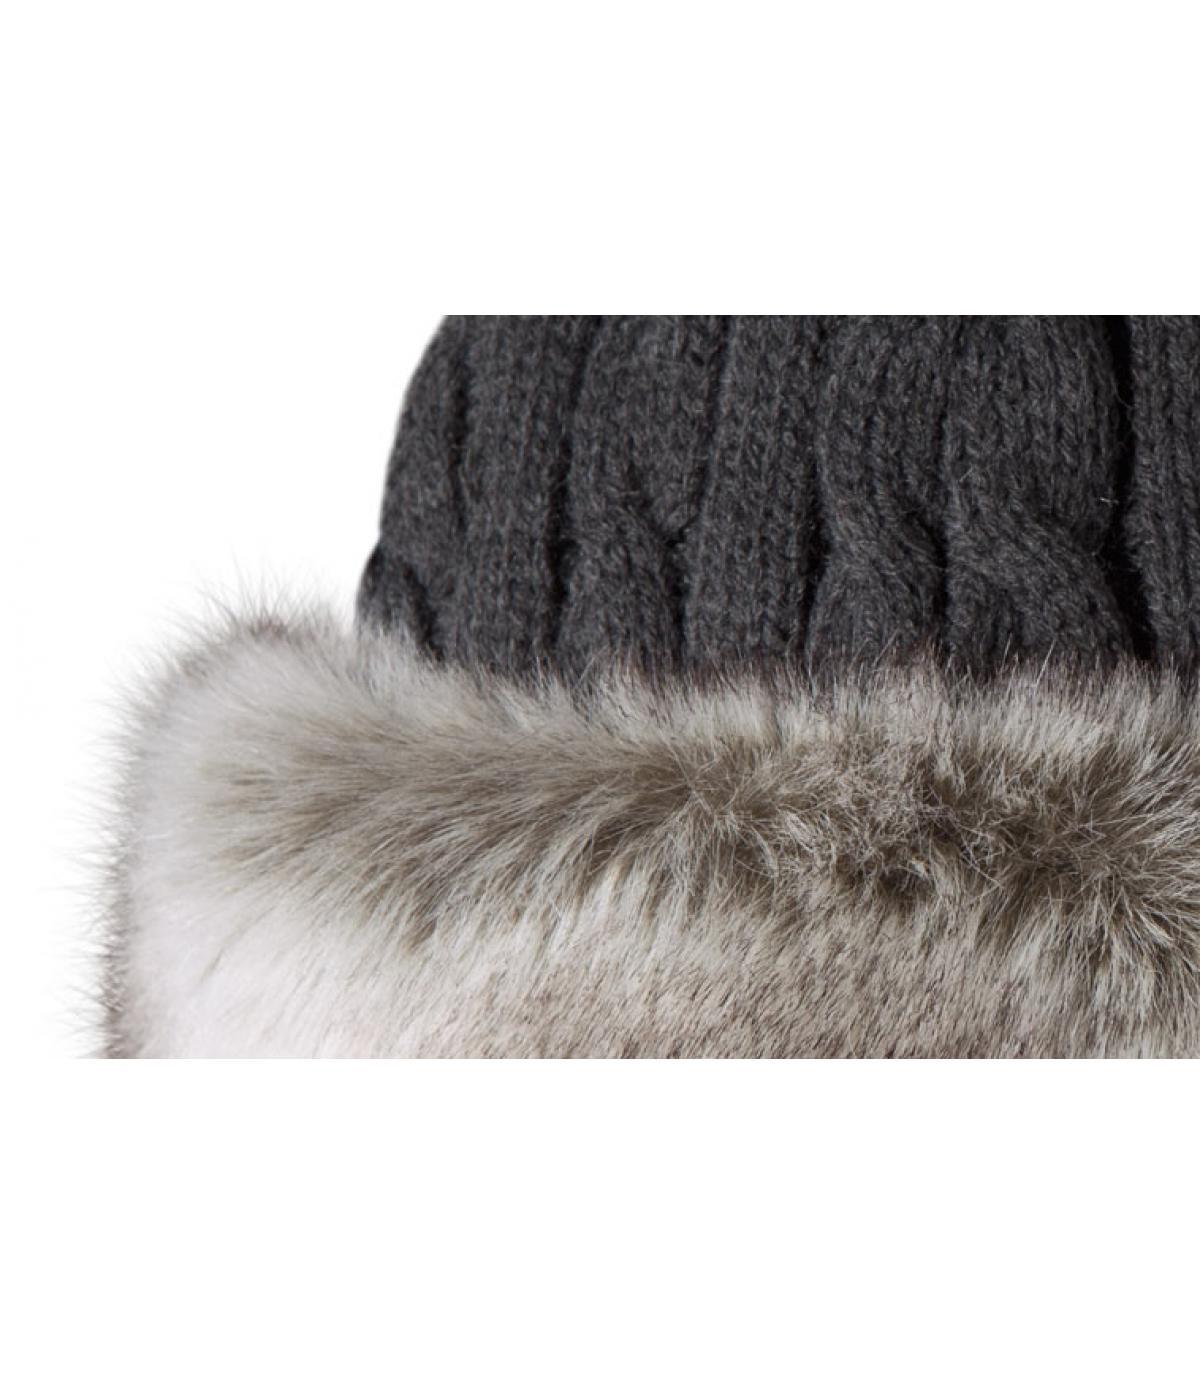 grey fur band head fur cable bandhat rabbit by barts. Black Bedroom Furniture Sets. Home Design Ideas